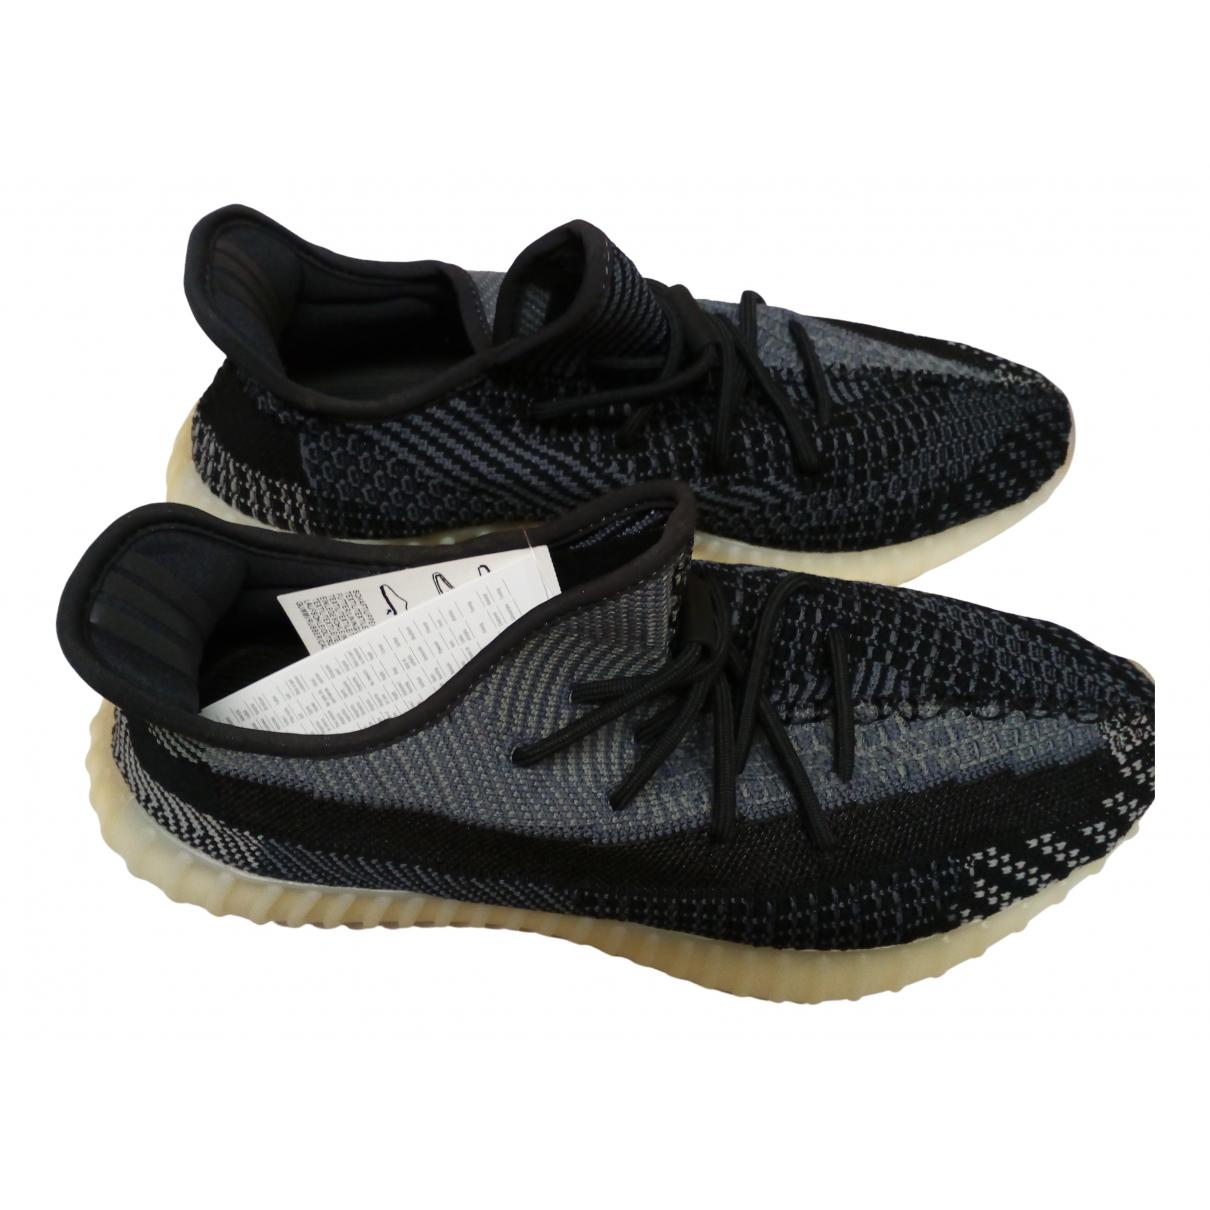 Yeezy X Adidas - Baskets Boost 350 V2 pour homme - noir